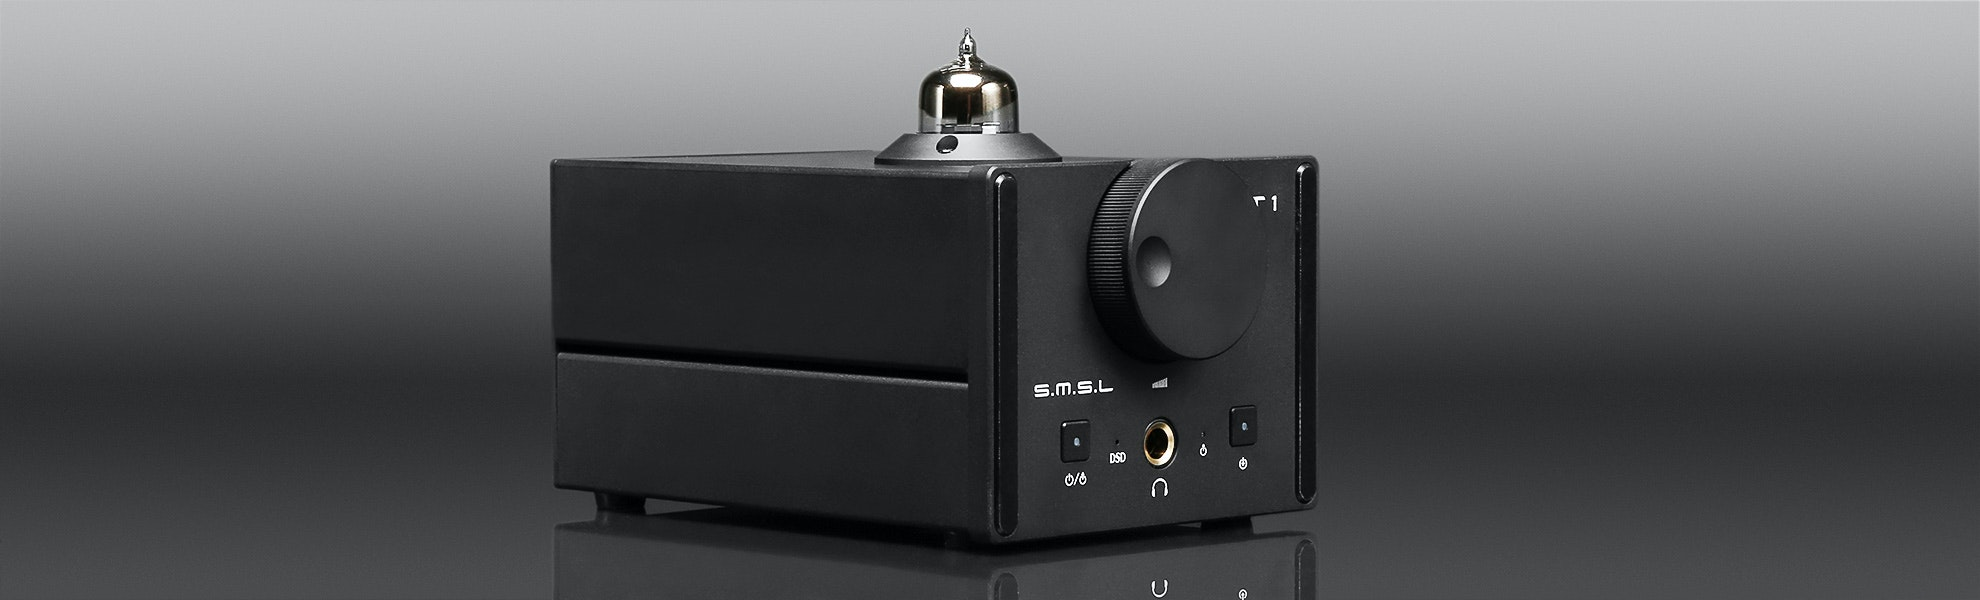 SMSL T1 DAC/Tube Amp